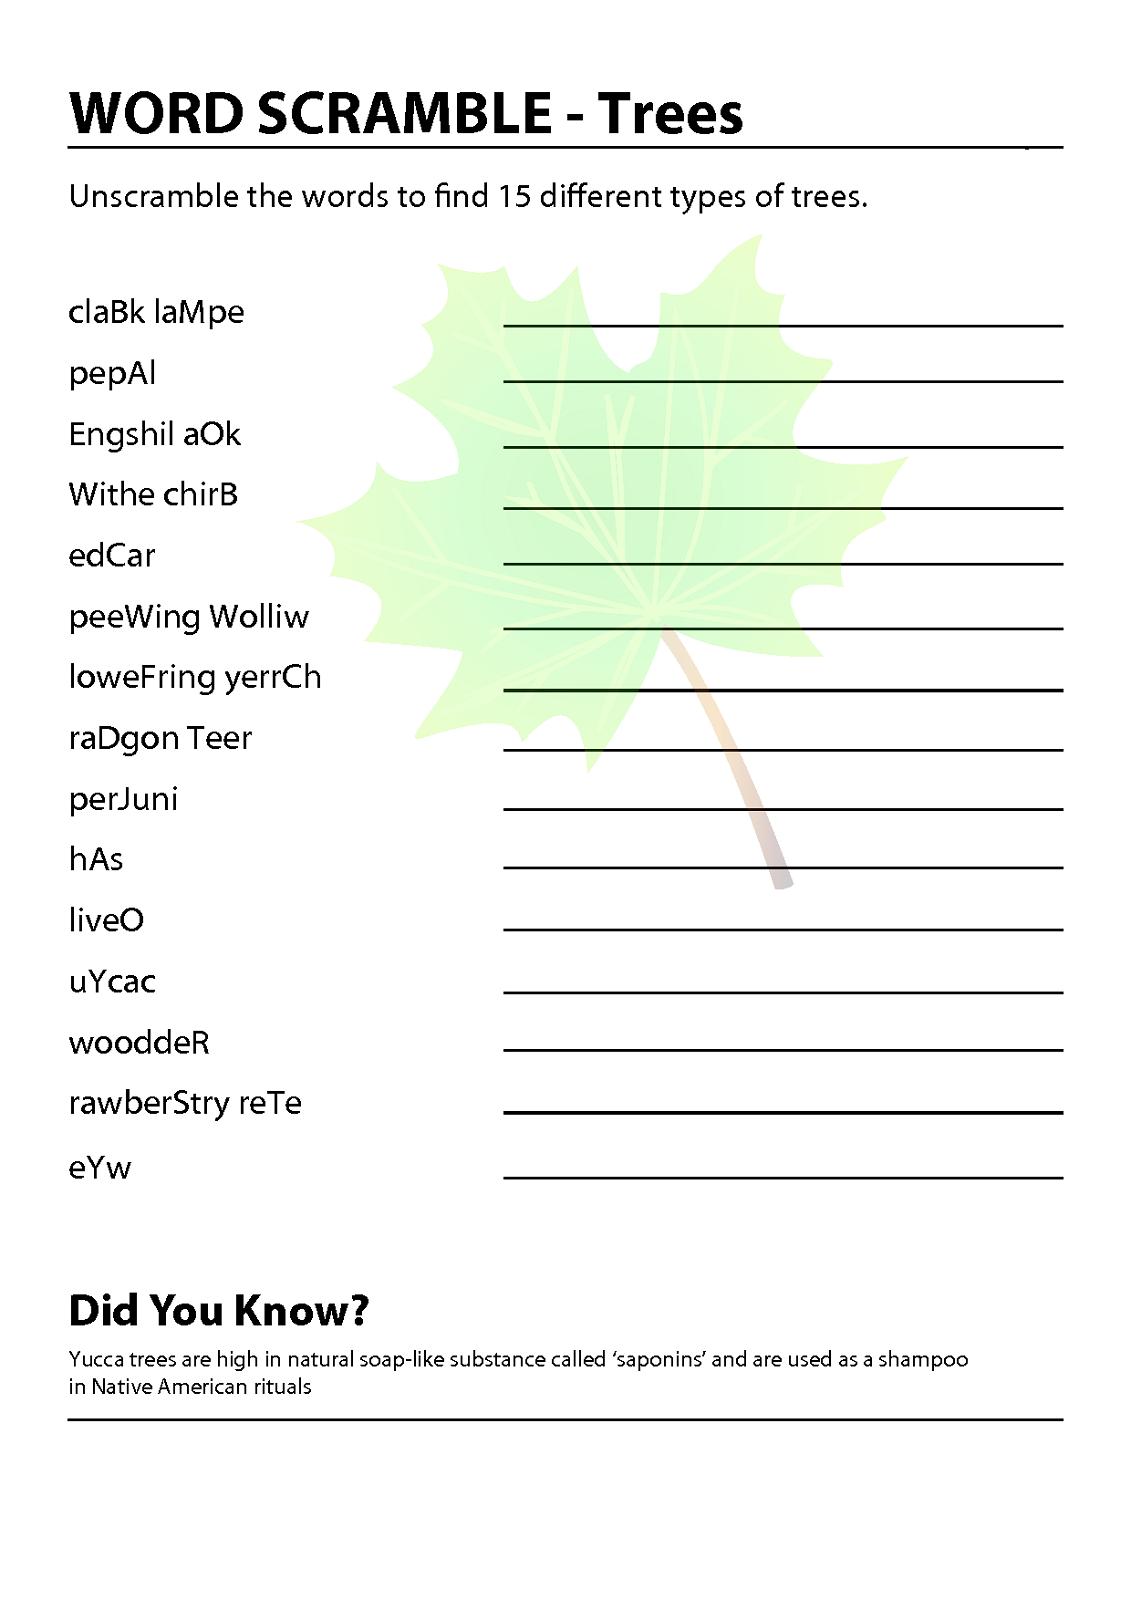 Word Scramble Worksheet Maker : New free printable word scramble worksheets goodsnyc